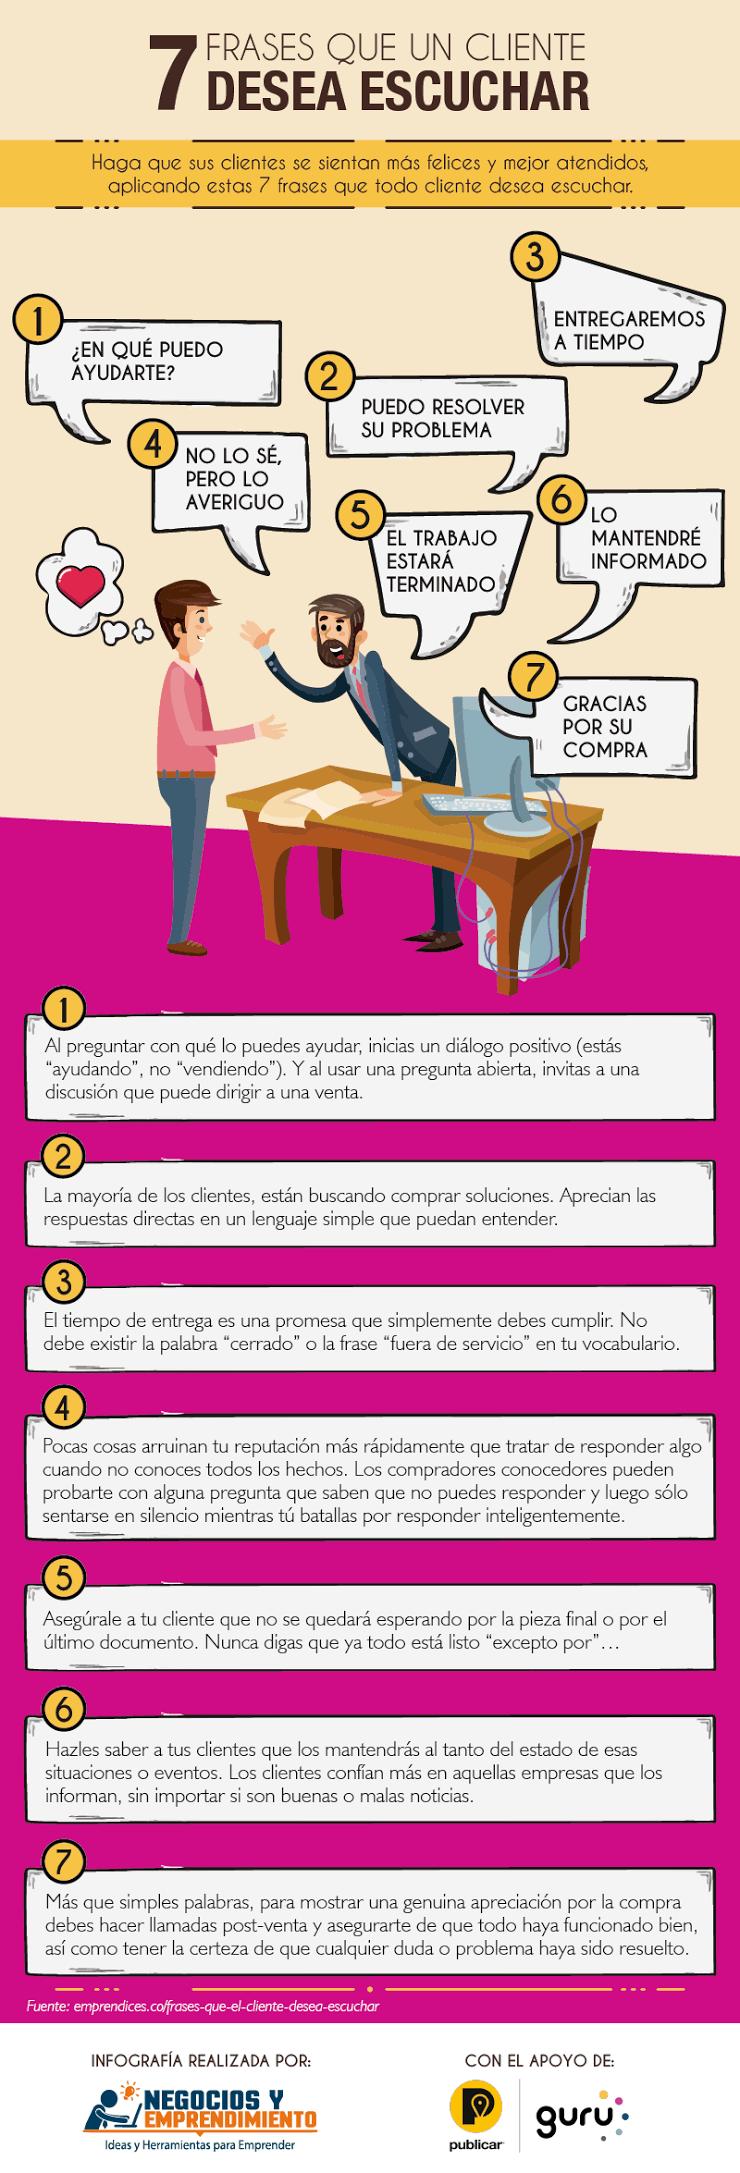 7 frases que tu cliente quiere escuchar